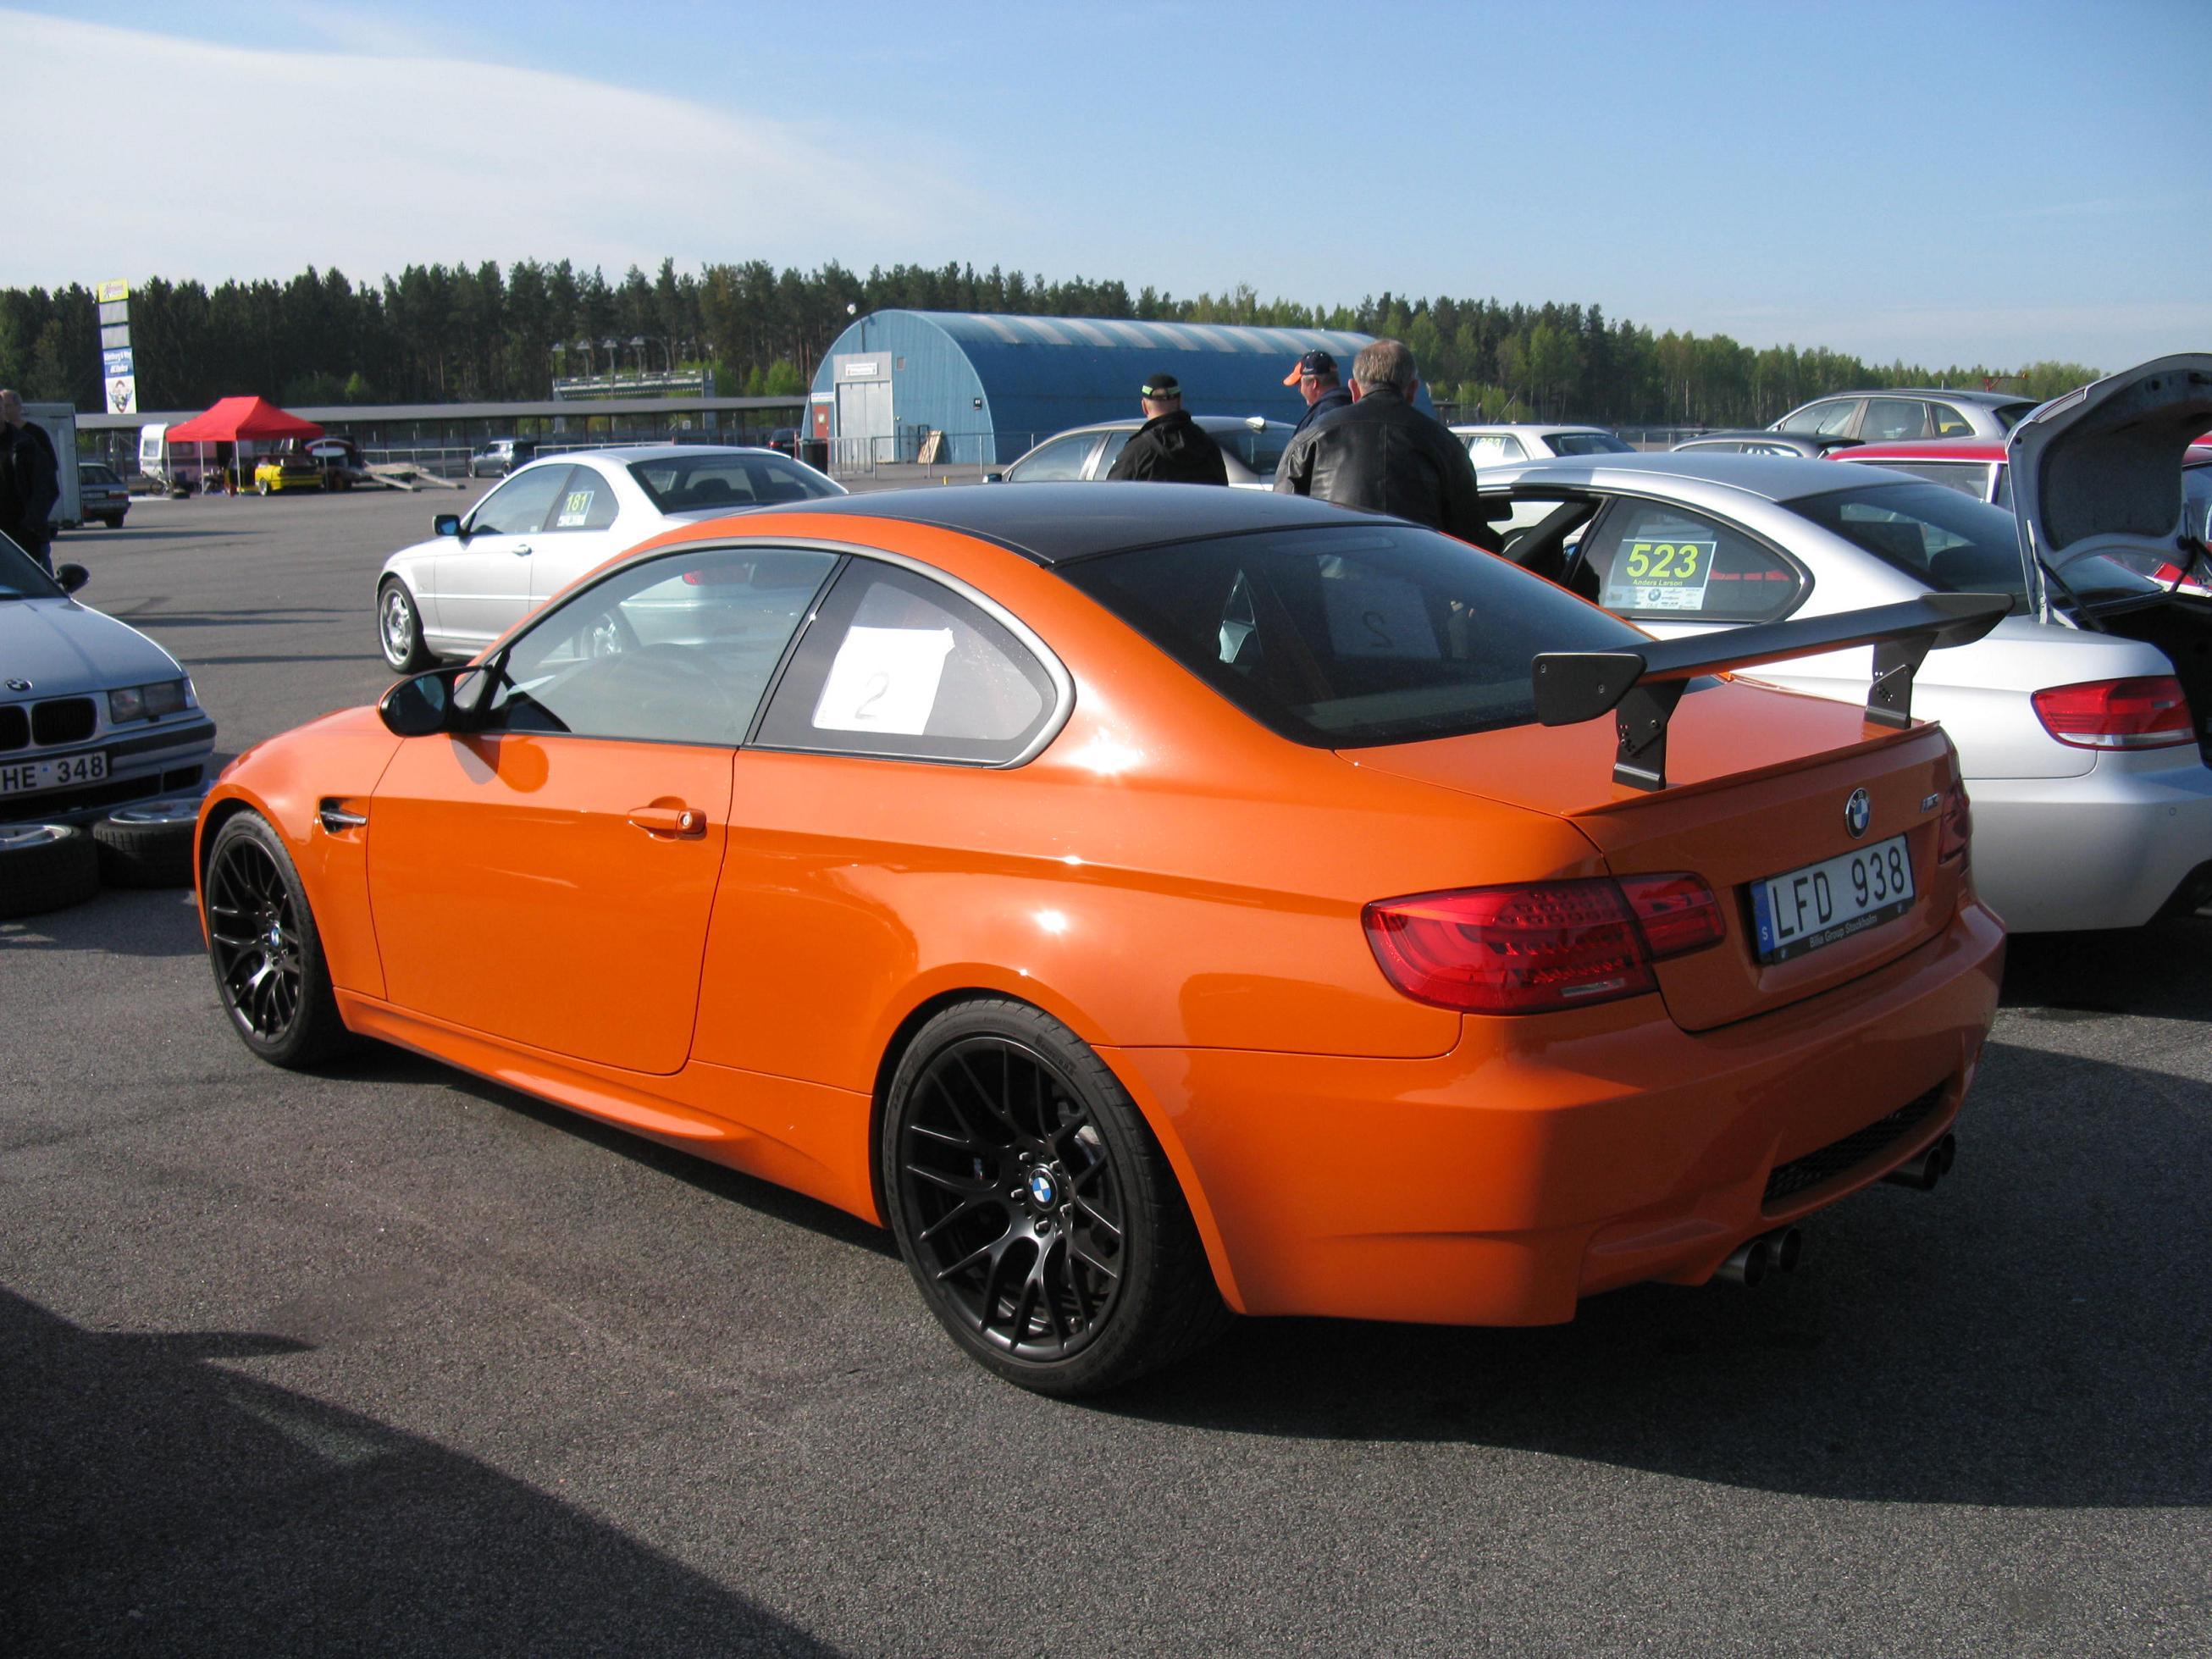 File:BMW M3 GTS E92 (5699109243).jpg - Wikimedia Commons